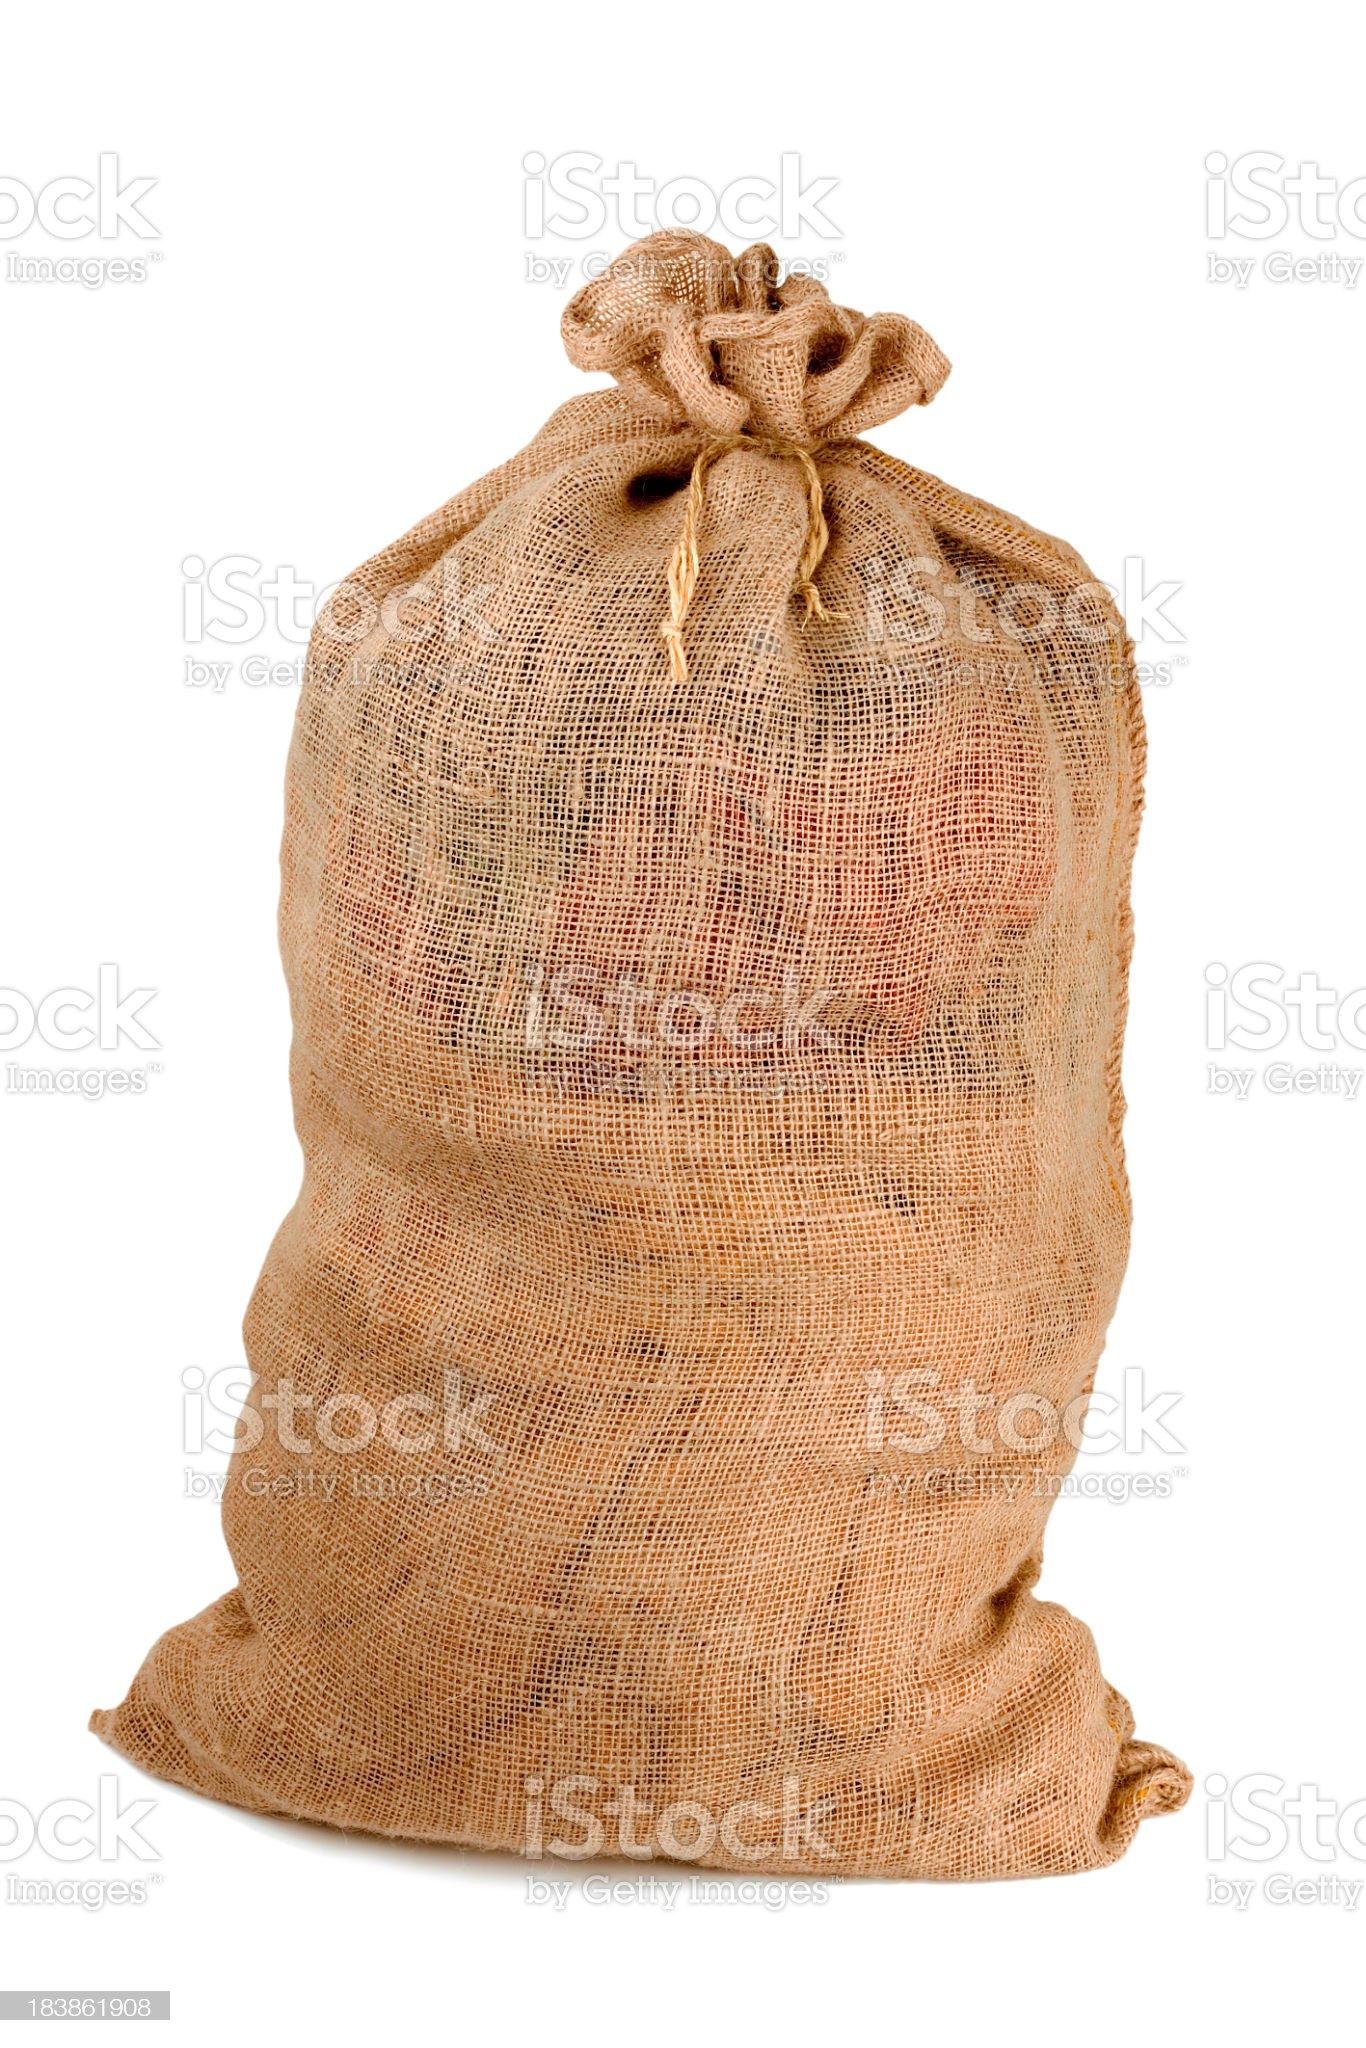 Full bag royalty-free stock photo